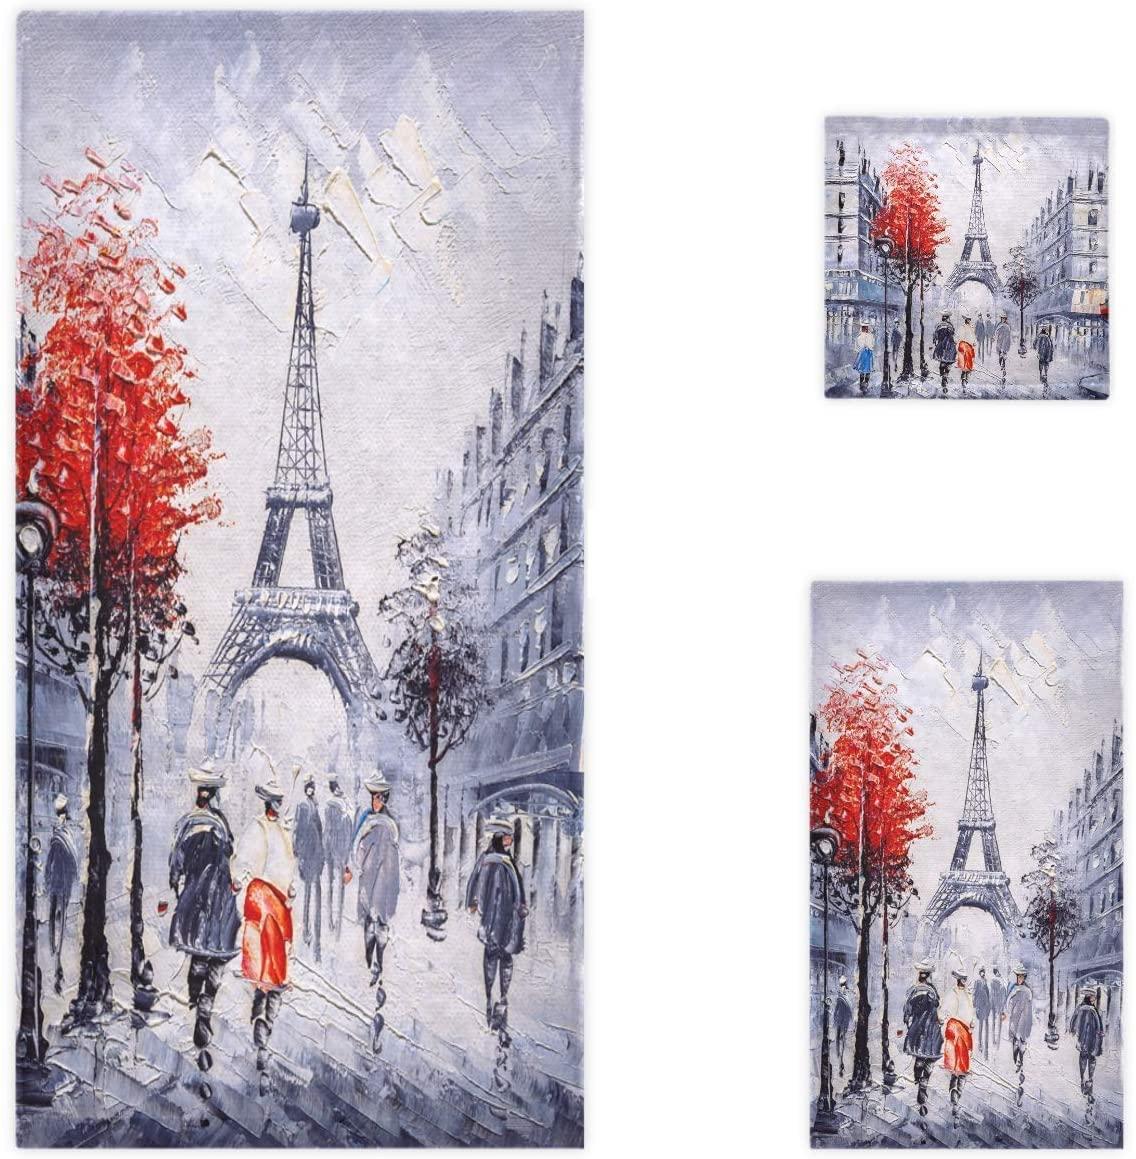 Naanle Stylish Paris Street Eiffel Tower Painting Soft Luxury Decorative Set of 3 Towels, 1 Bath Towel+1 Hand Towel+1 Washcloth, Multipurpose for Bathroom, Hotel, Gym, Spa and Beach